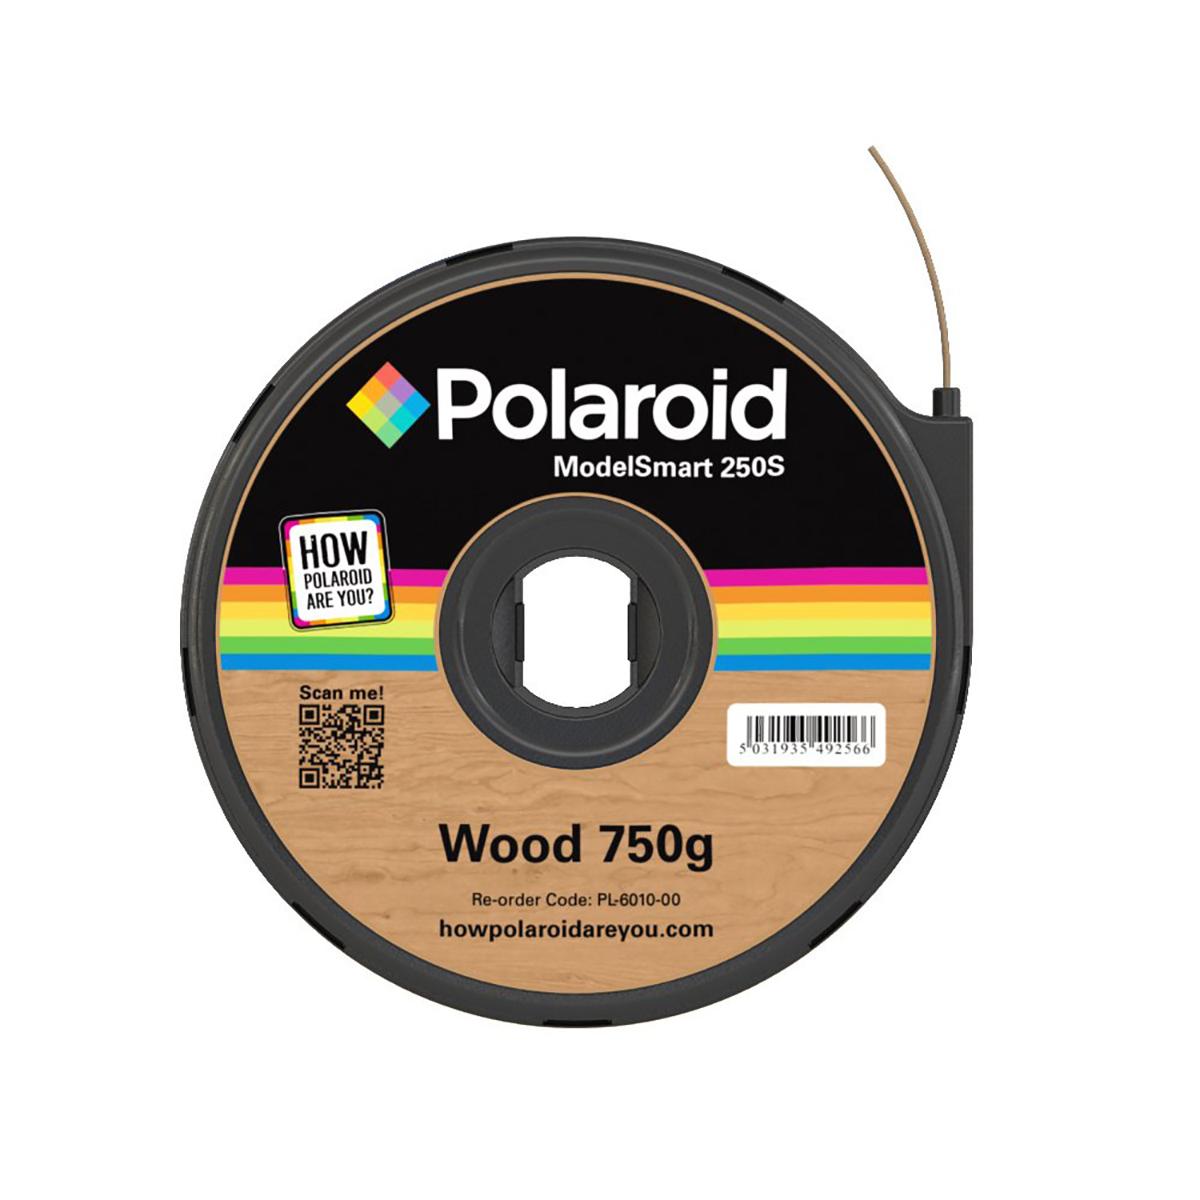 Polaroid ModelSmart 250S Wood Filament Cartridge - 750g